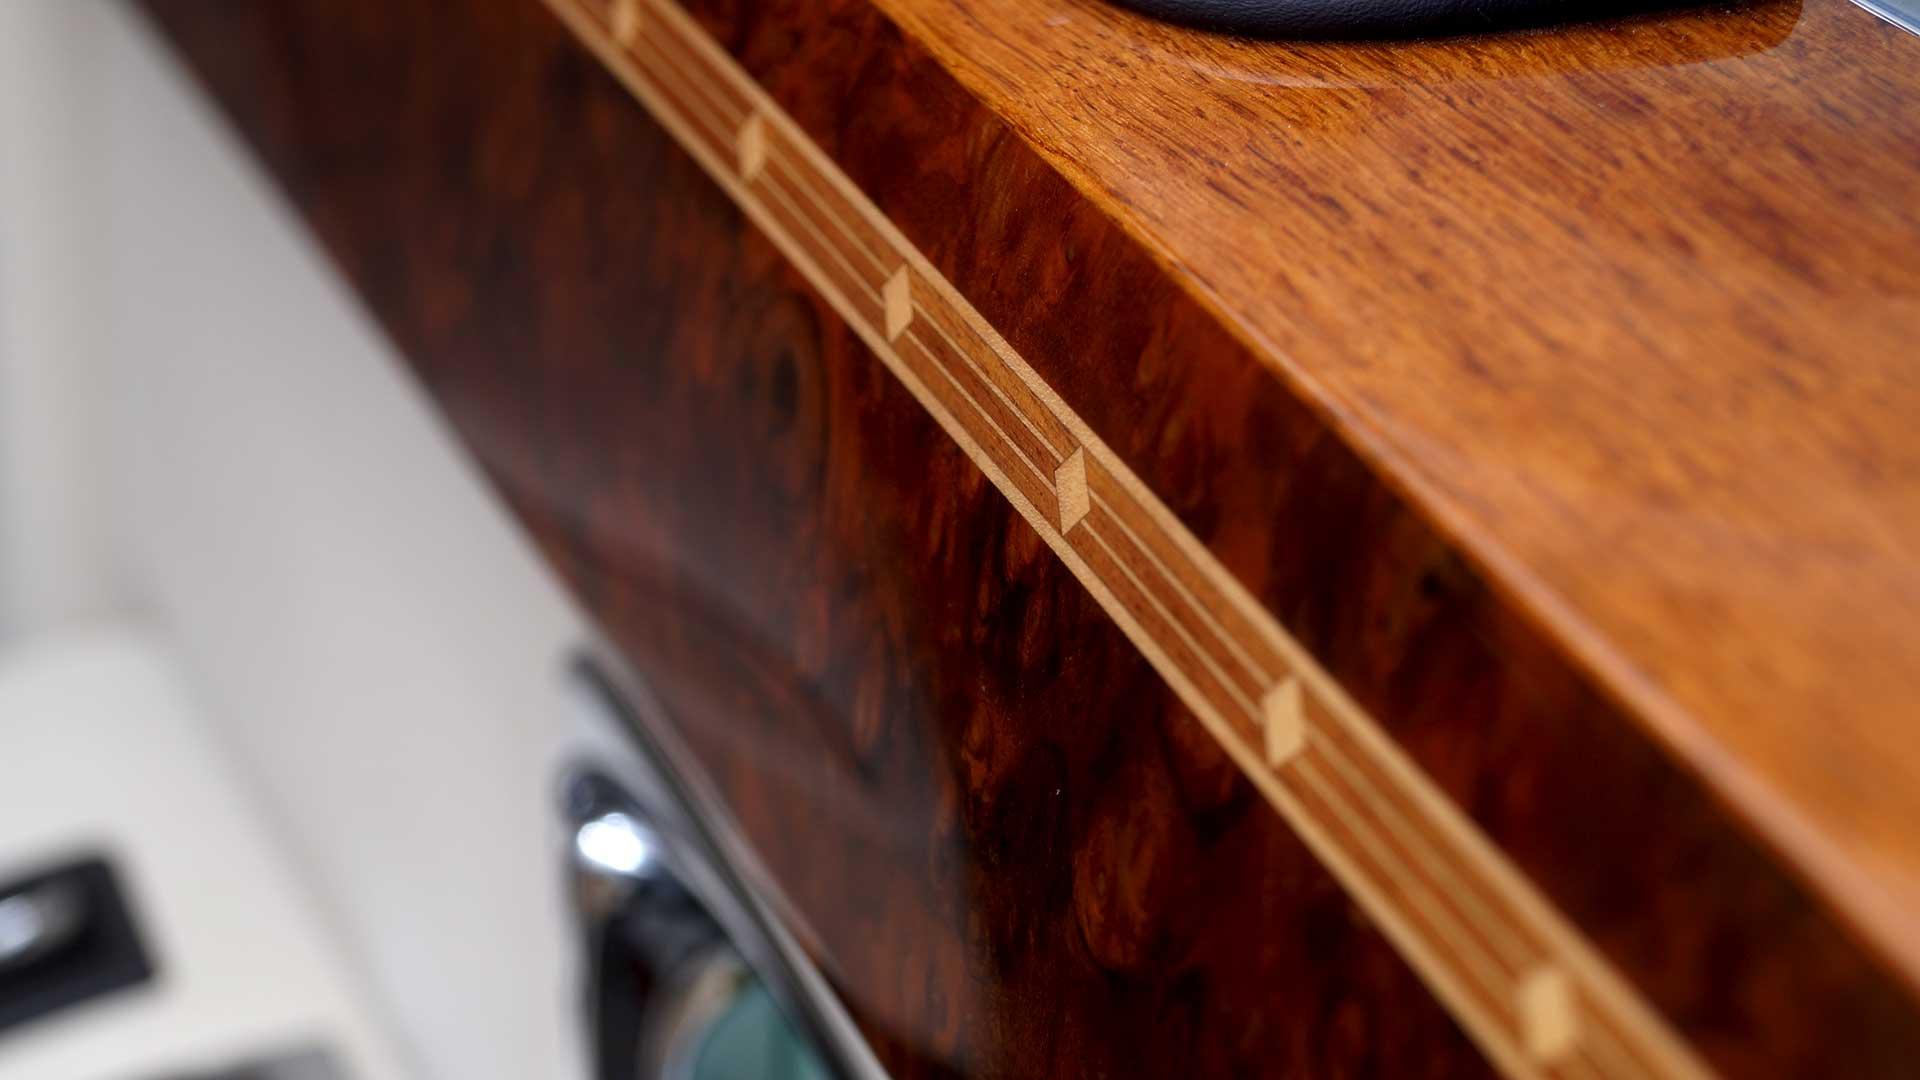 Rolls-Royce Phantom Walnut Marquetry Close-Up